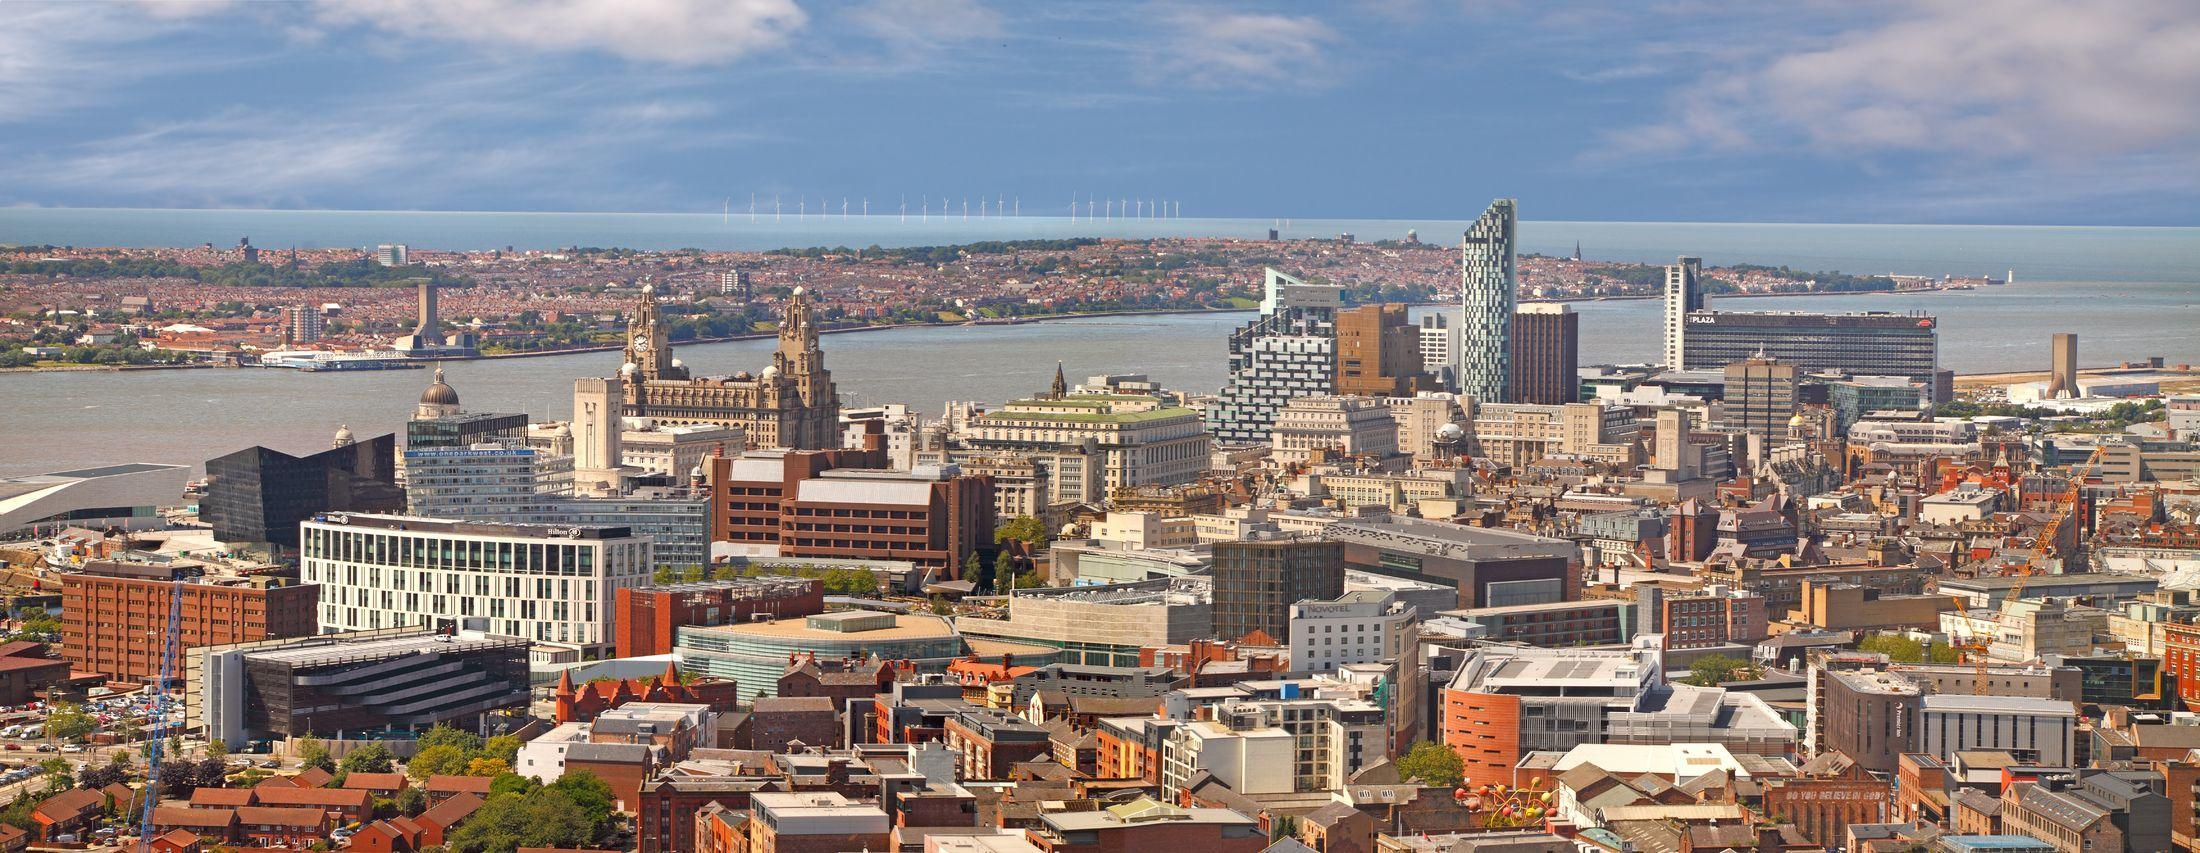 Pohled na Liverpool | gilbertdestoke/123RF.com